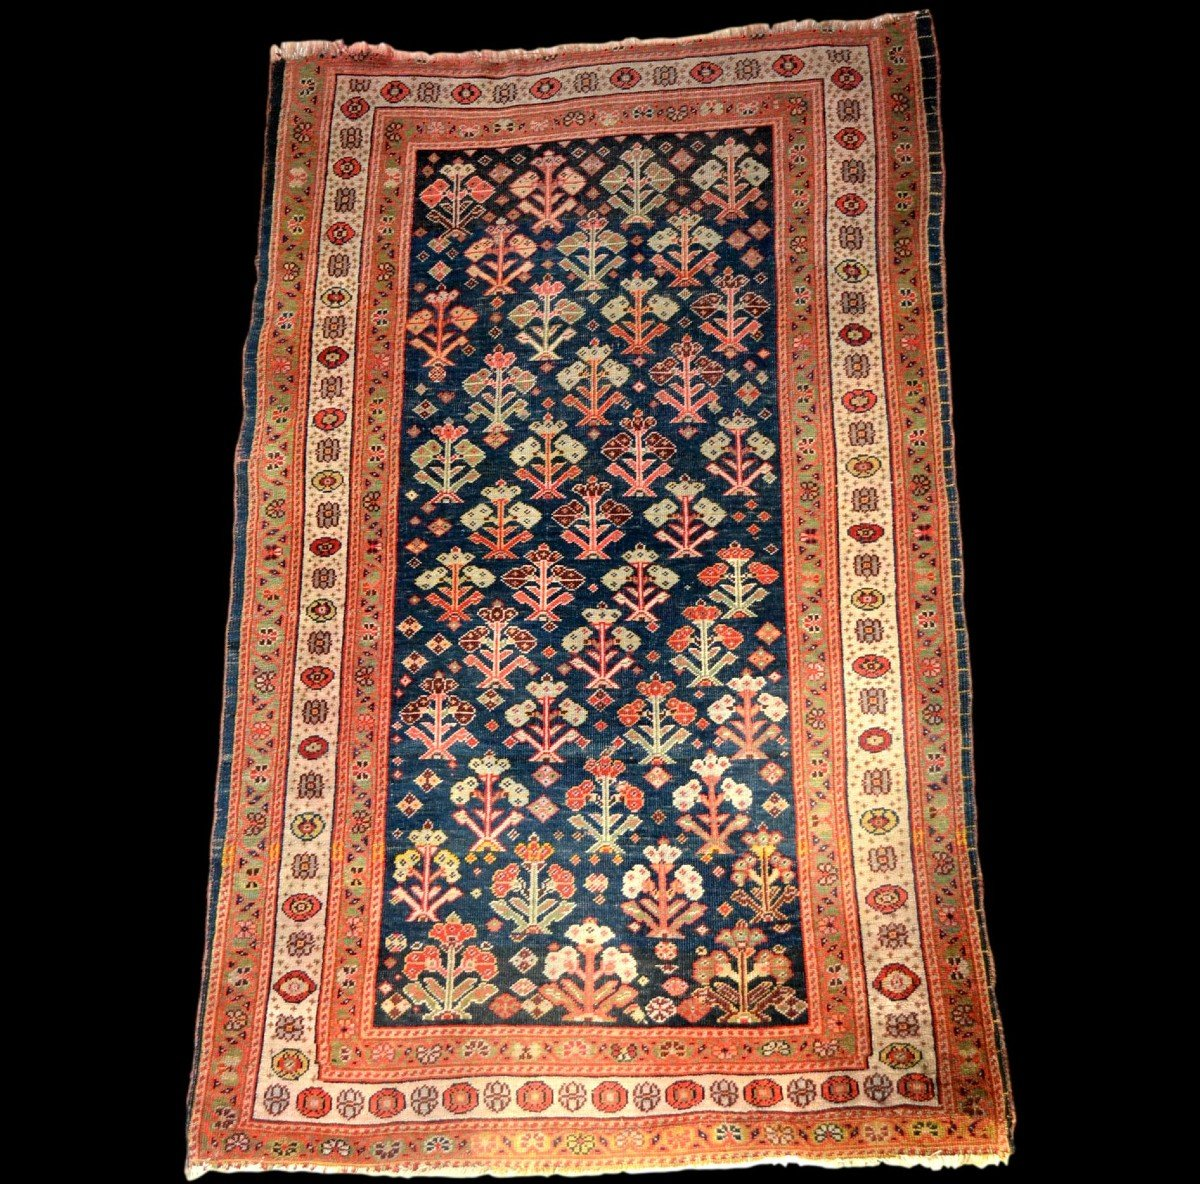 Old Kouba Carpet, Caucasus, 83 Cm X 133 Cm, Wool On Wool, Early 20th Century